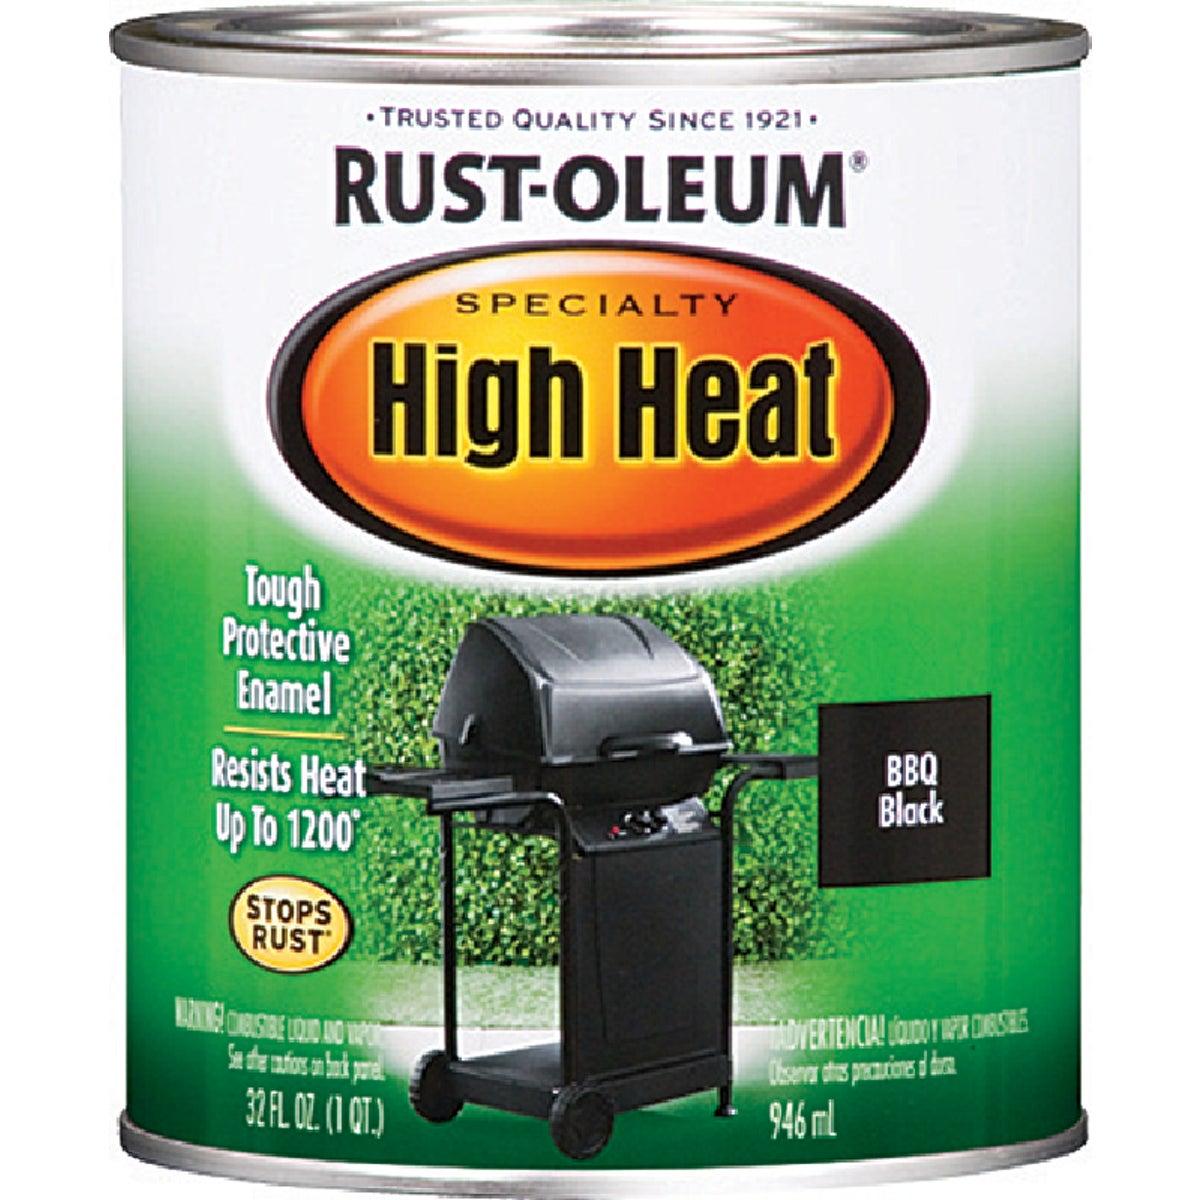 BBQ BLK HIGH-HEAT ENAMEL - 7778-502 by Rustoleum